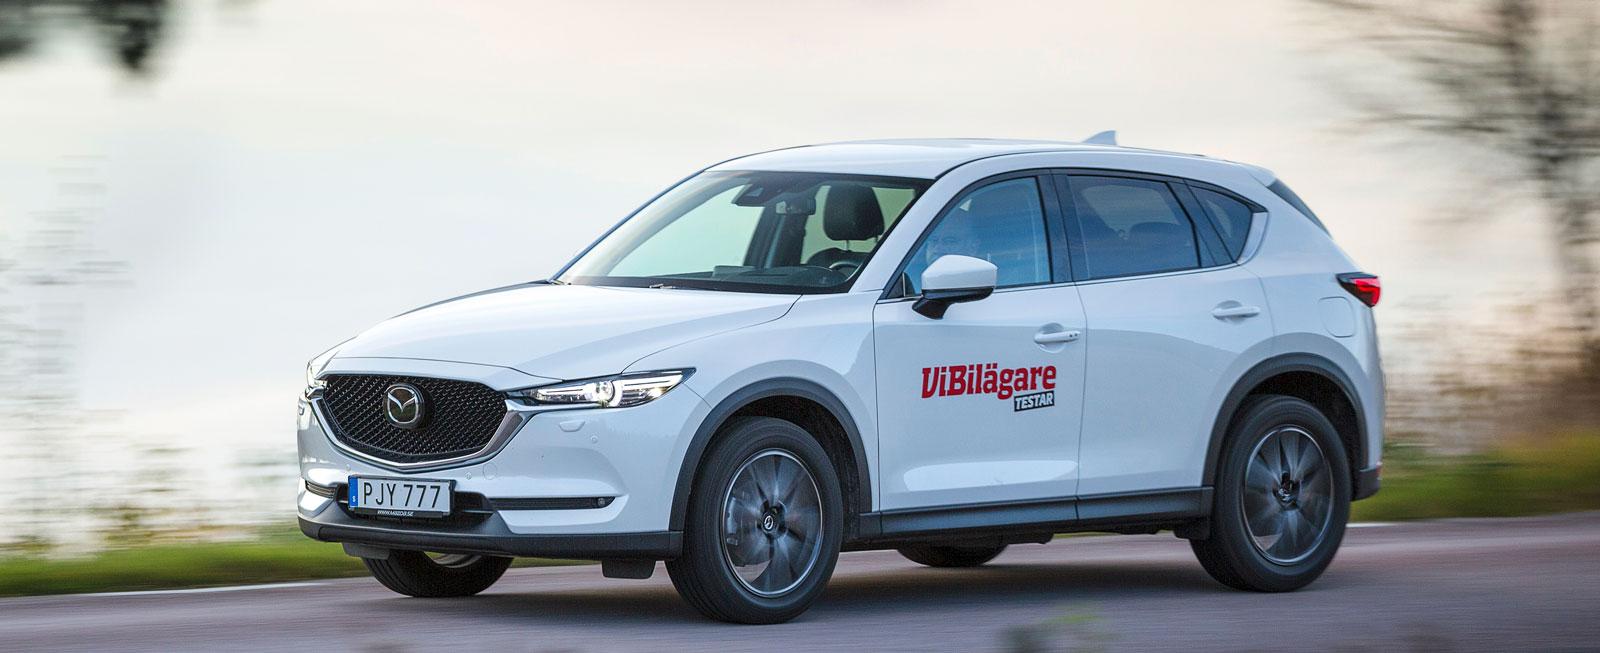 Test: Mazda CX-5, Nissan X-Trail och Renault Koleos (2017)